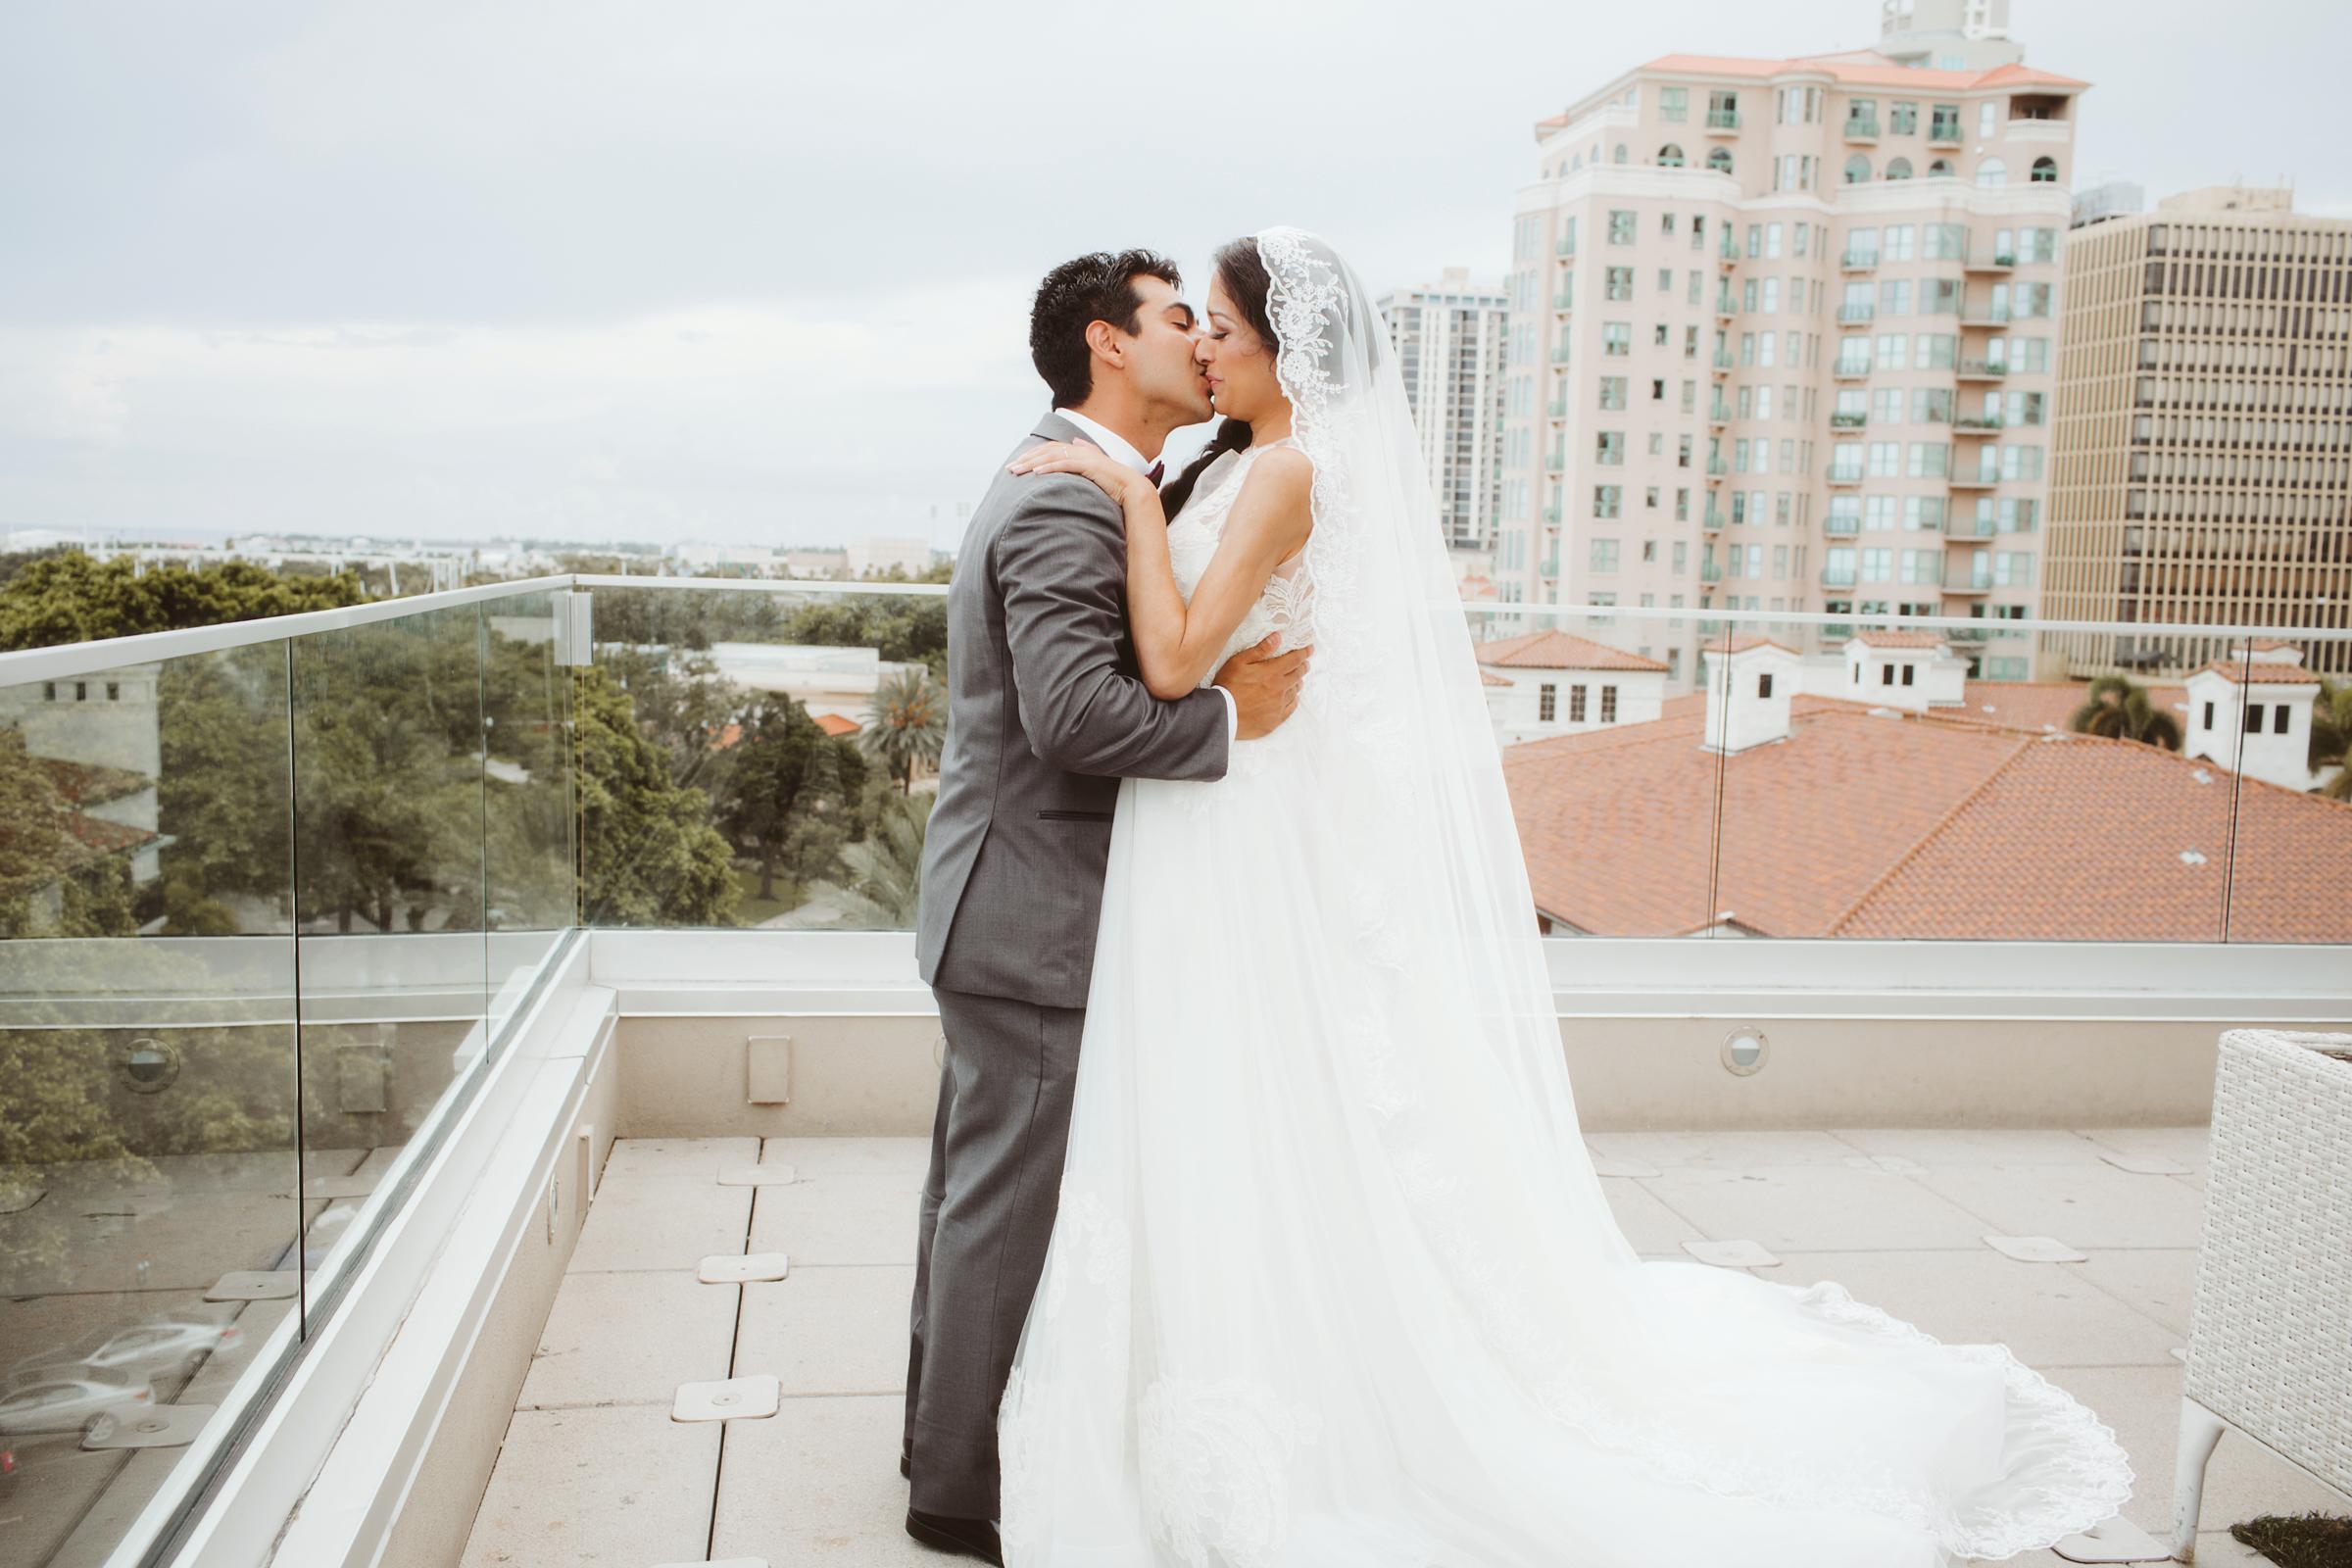 wedding day | MFA St Pete | Vanessa Boy Photography | vanessaboy.com-150.com |final.jpg